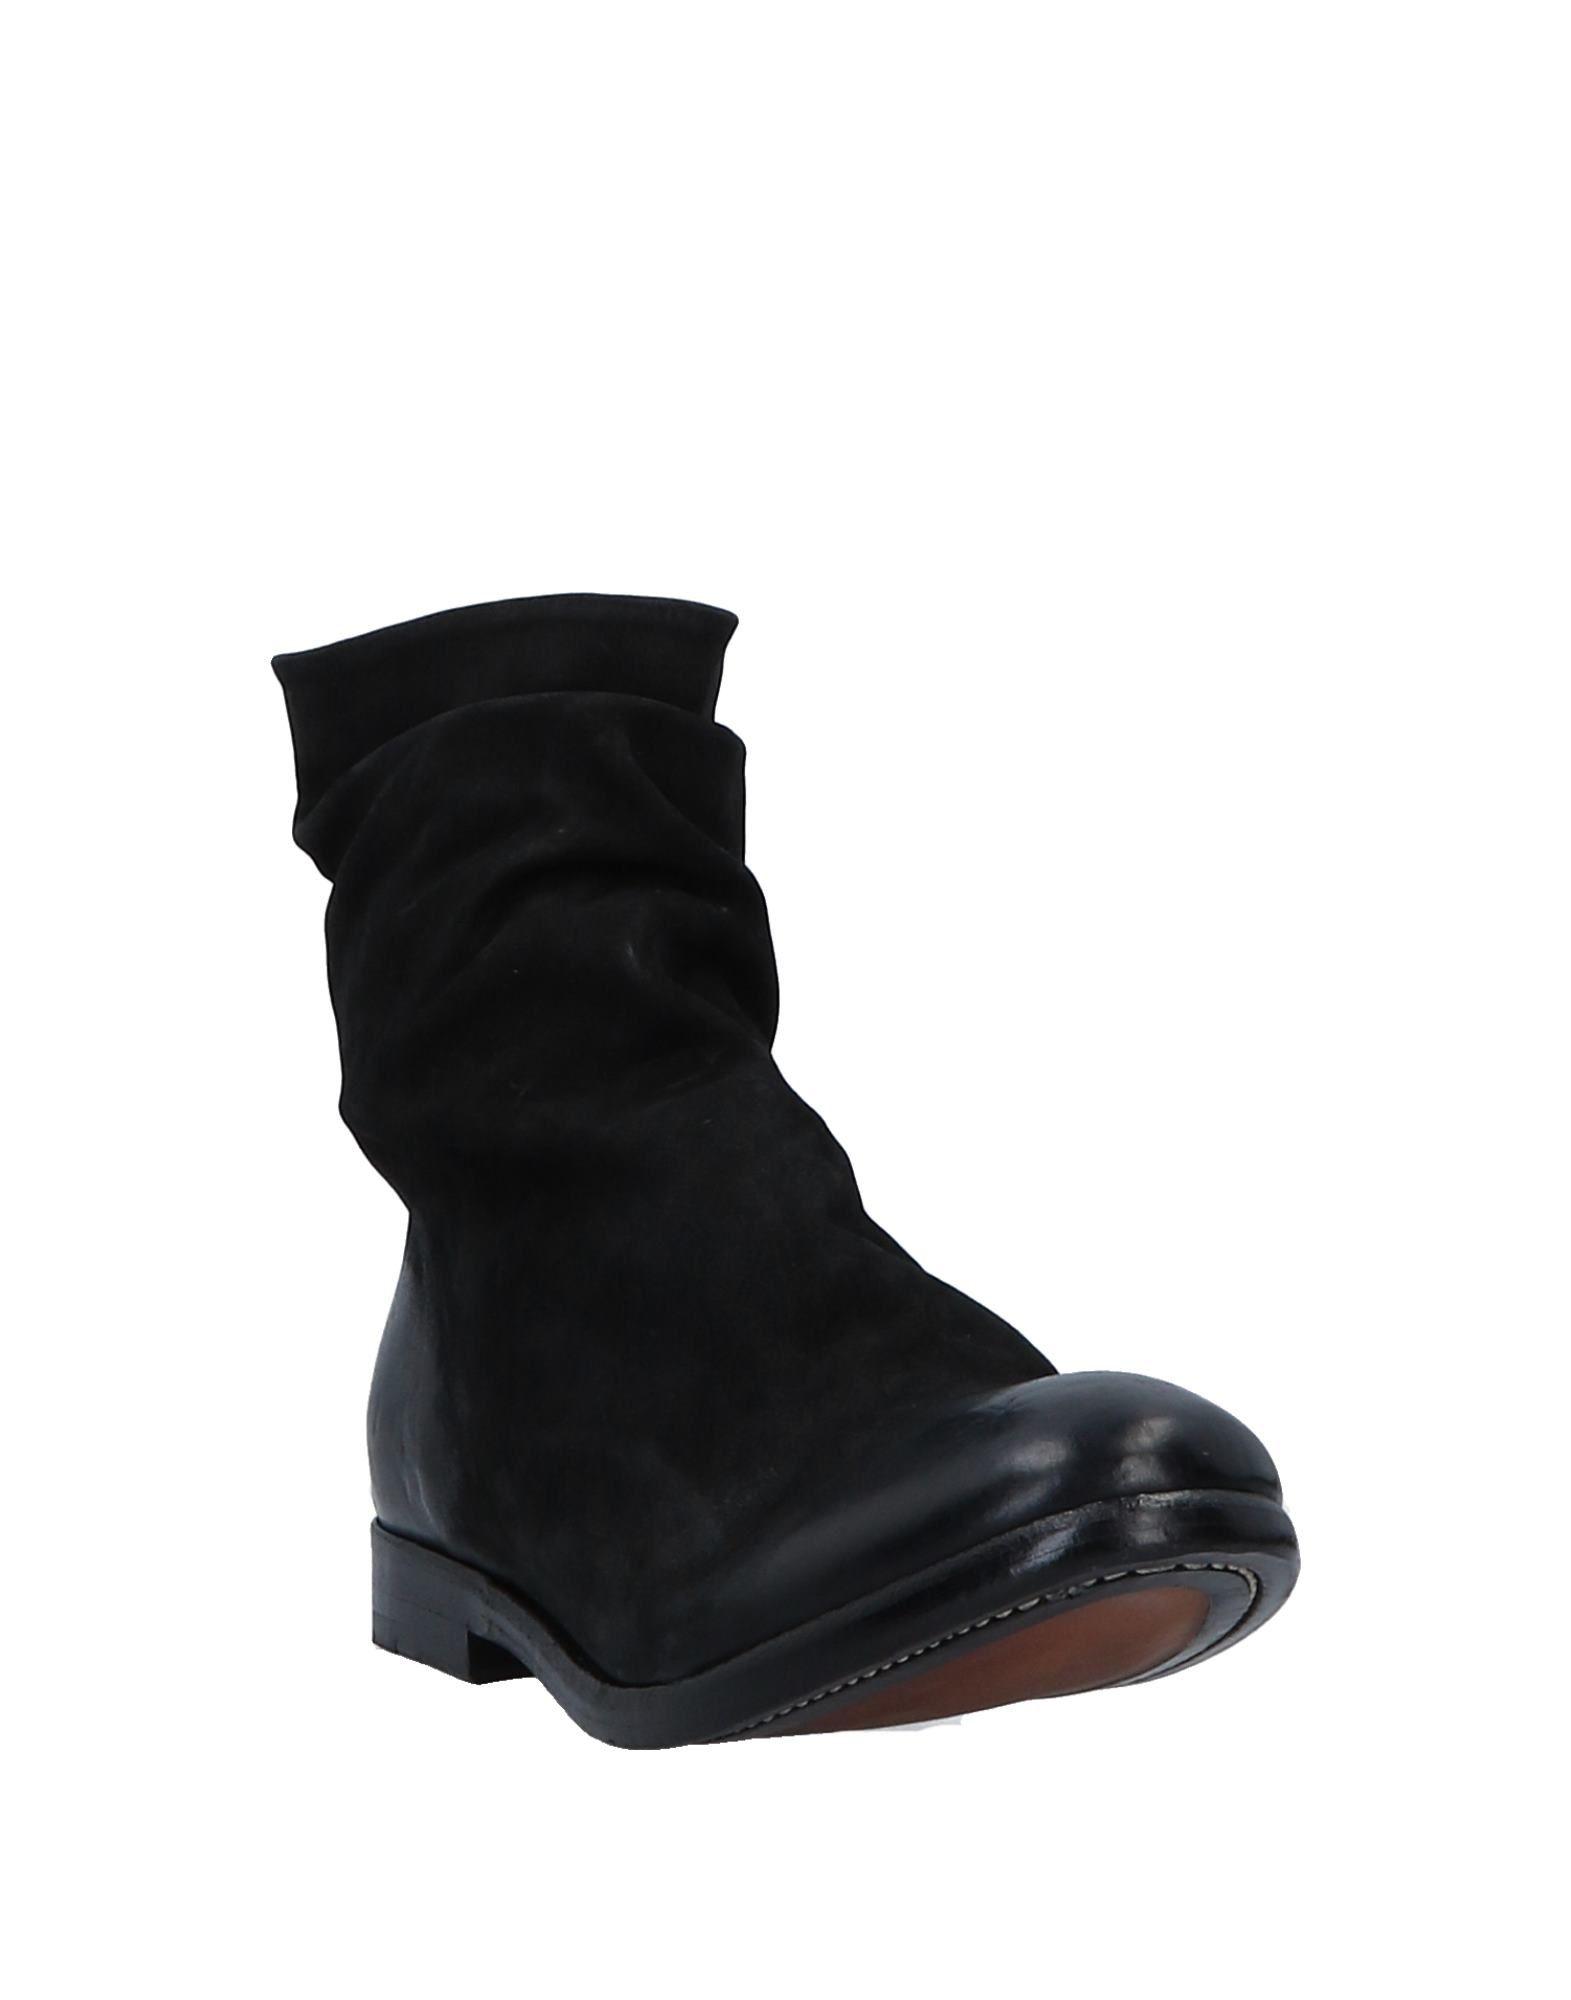 Rabatt Schuhe Stiefelette The Last Conspiracy Stiefelette Schuhe Damen  11519632EQ 826575